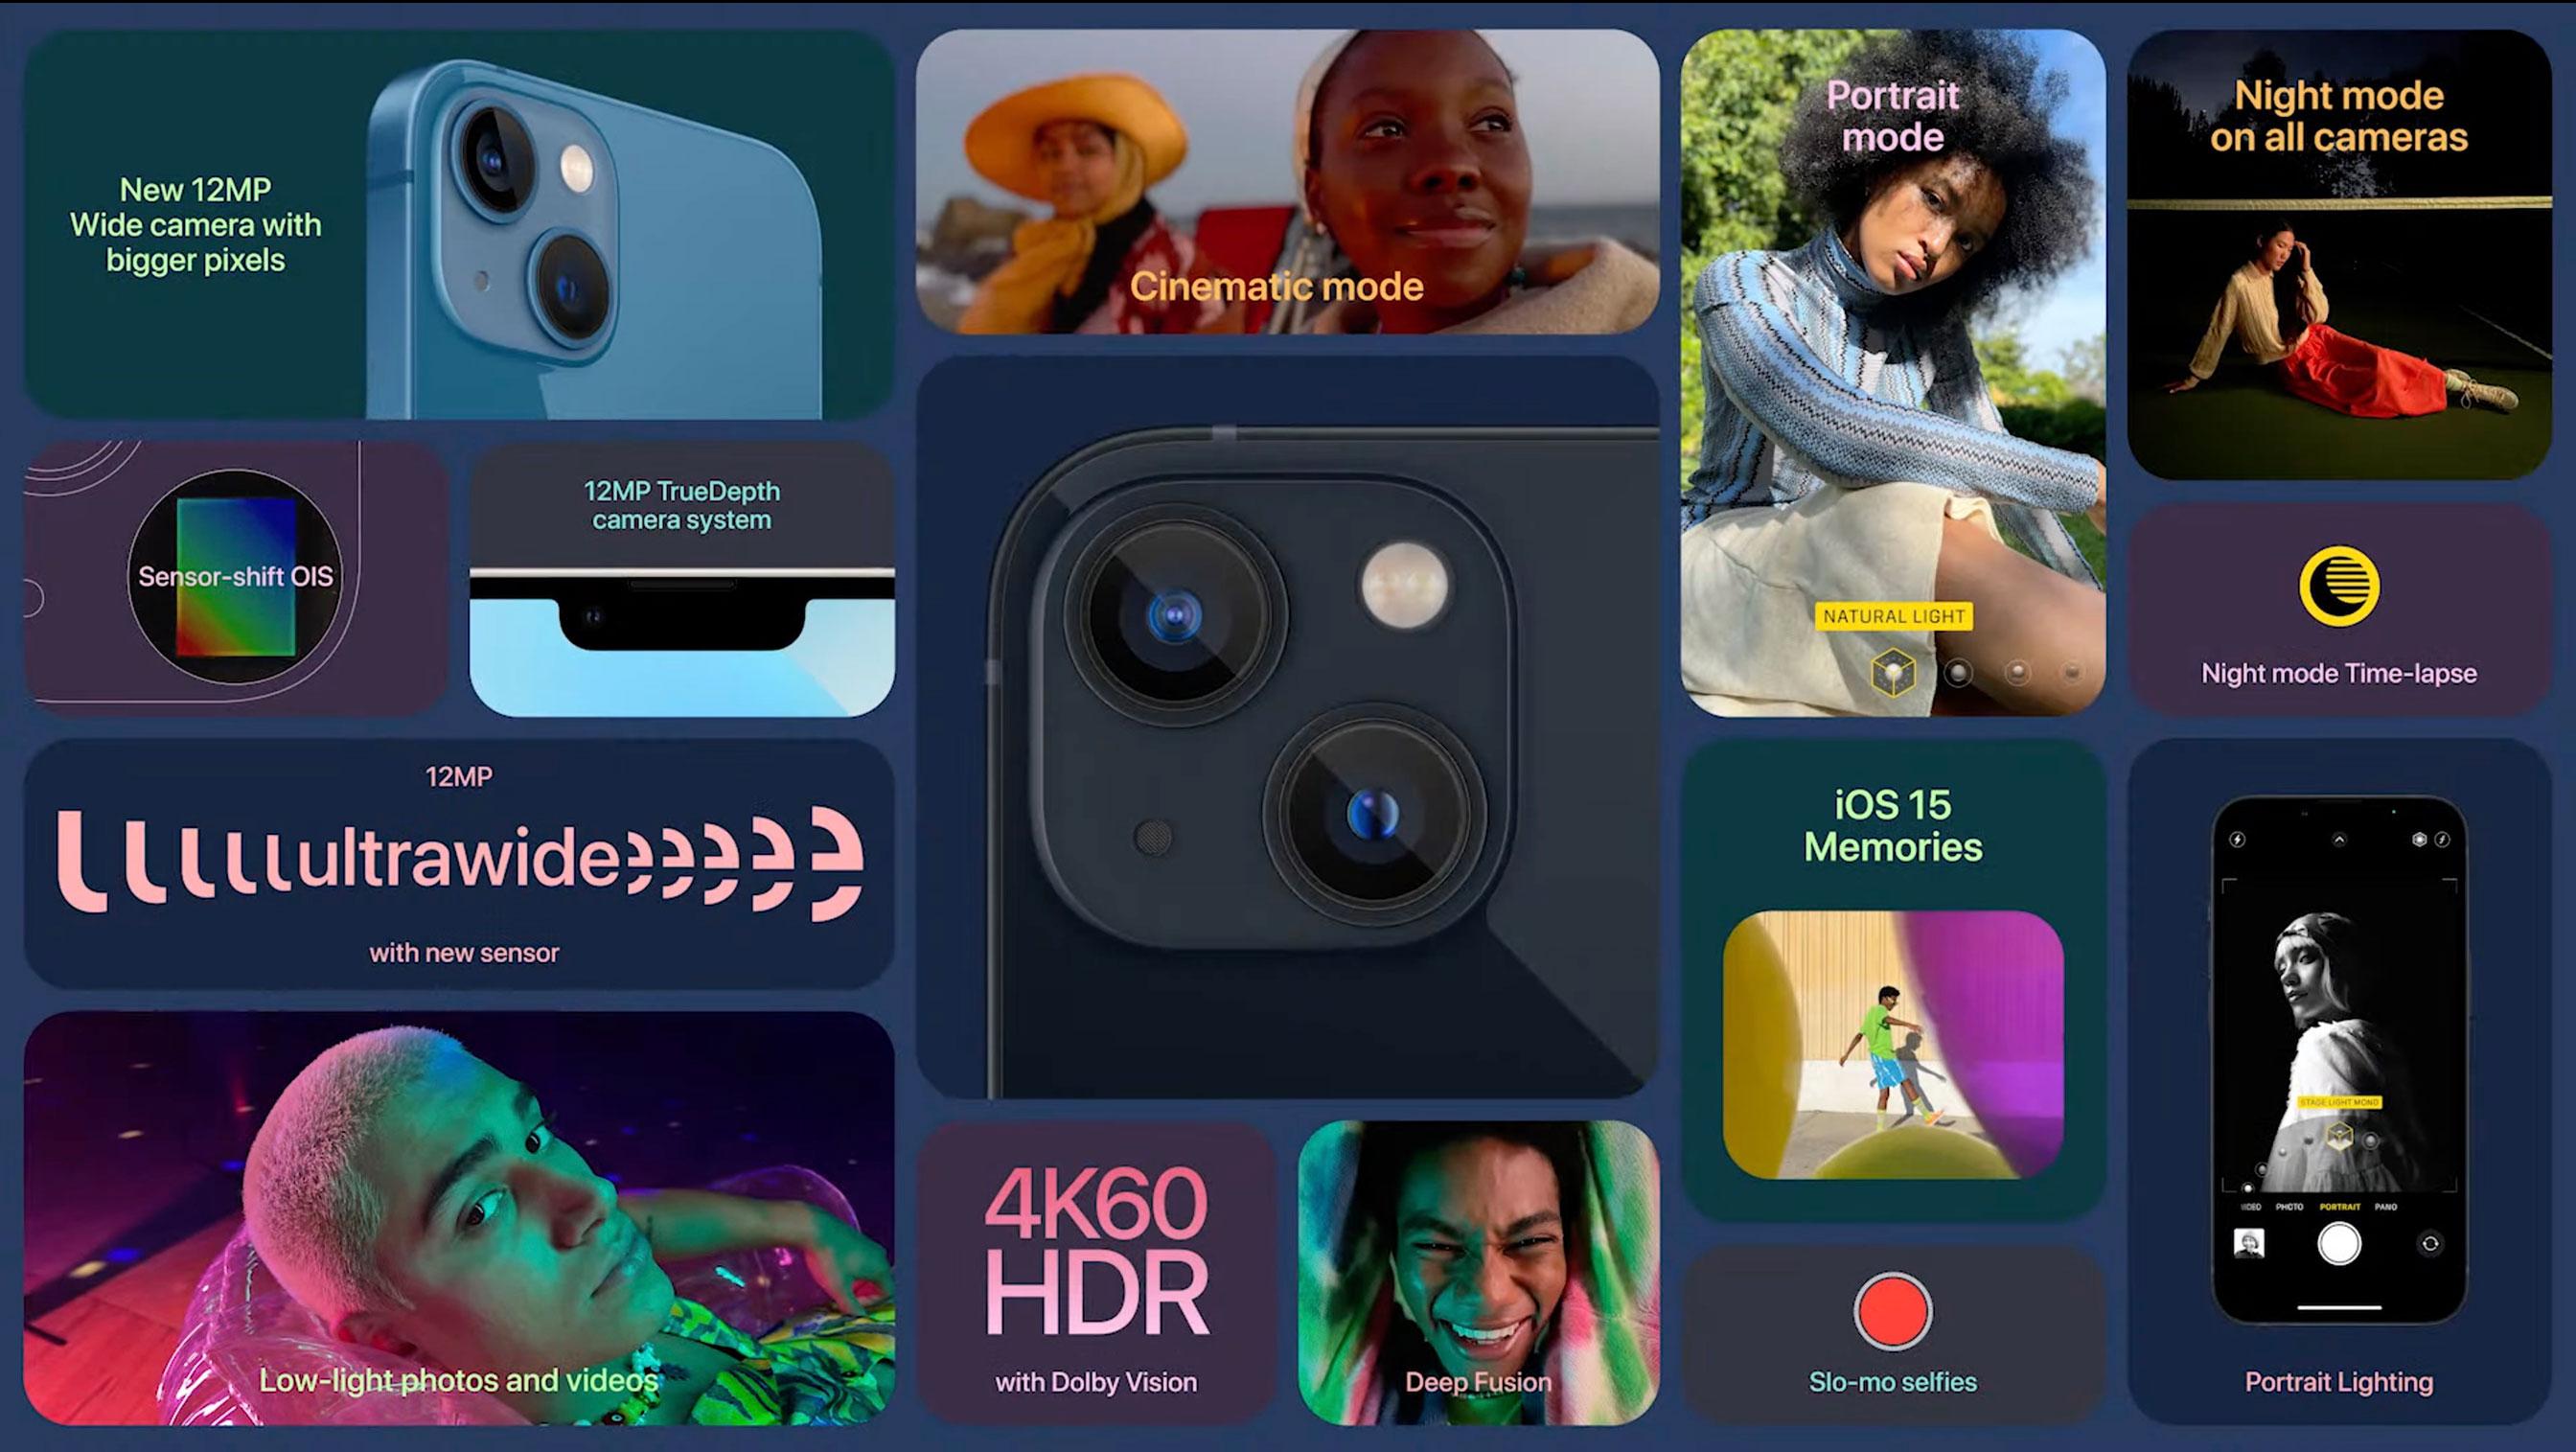 https://www.macfreak.nl/modules/news/images/zArt.iPhone13iPhone13MiniPresentatieSlide-2.jpg